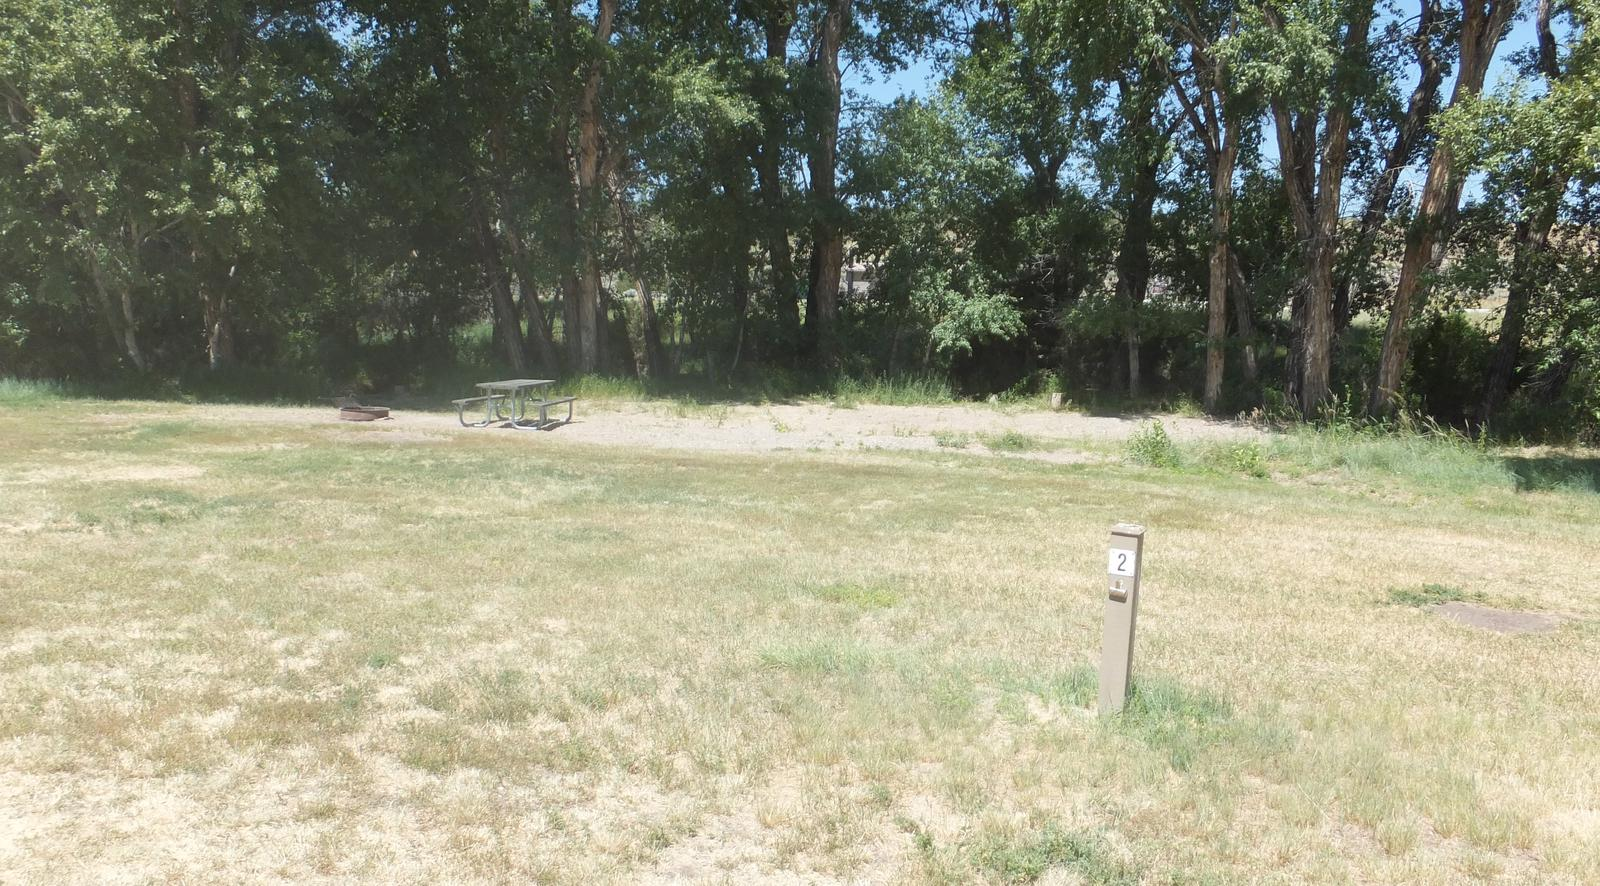 Hellgate Campground - Campsite 2